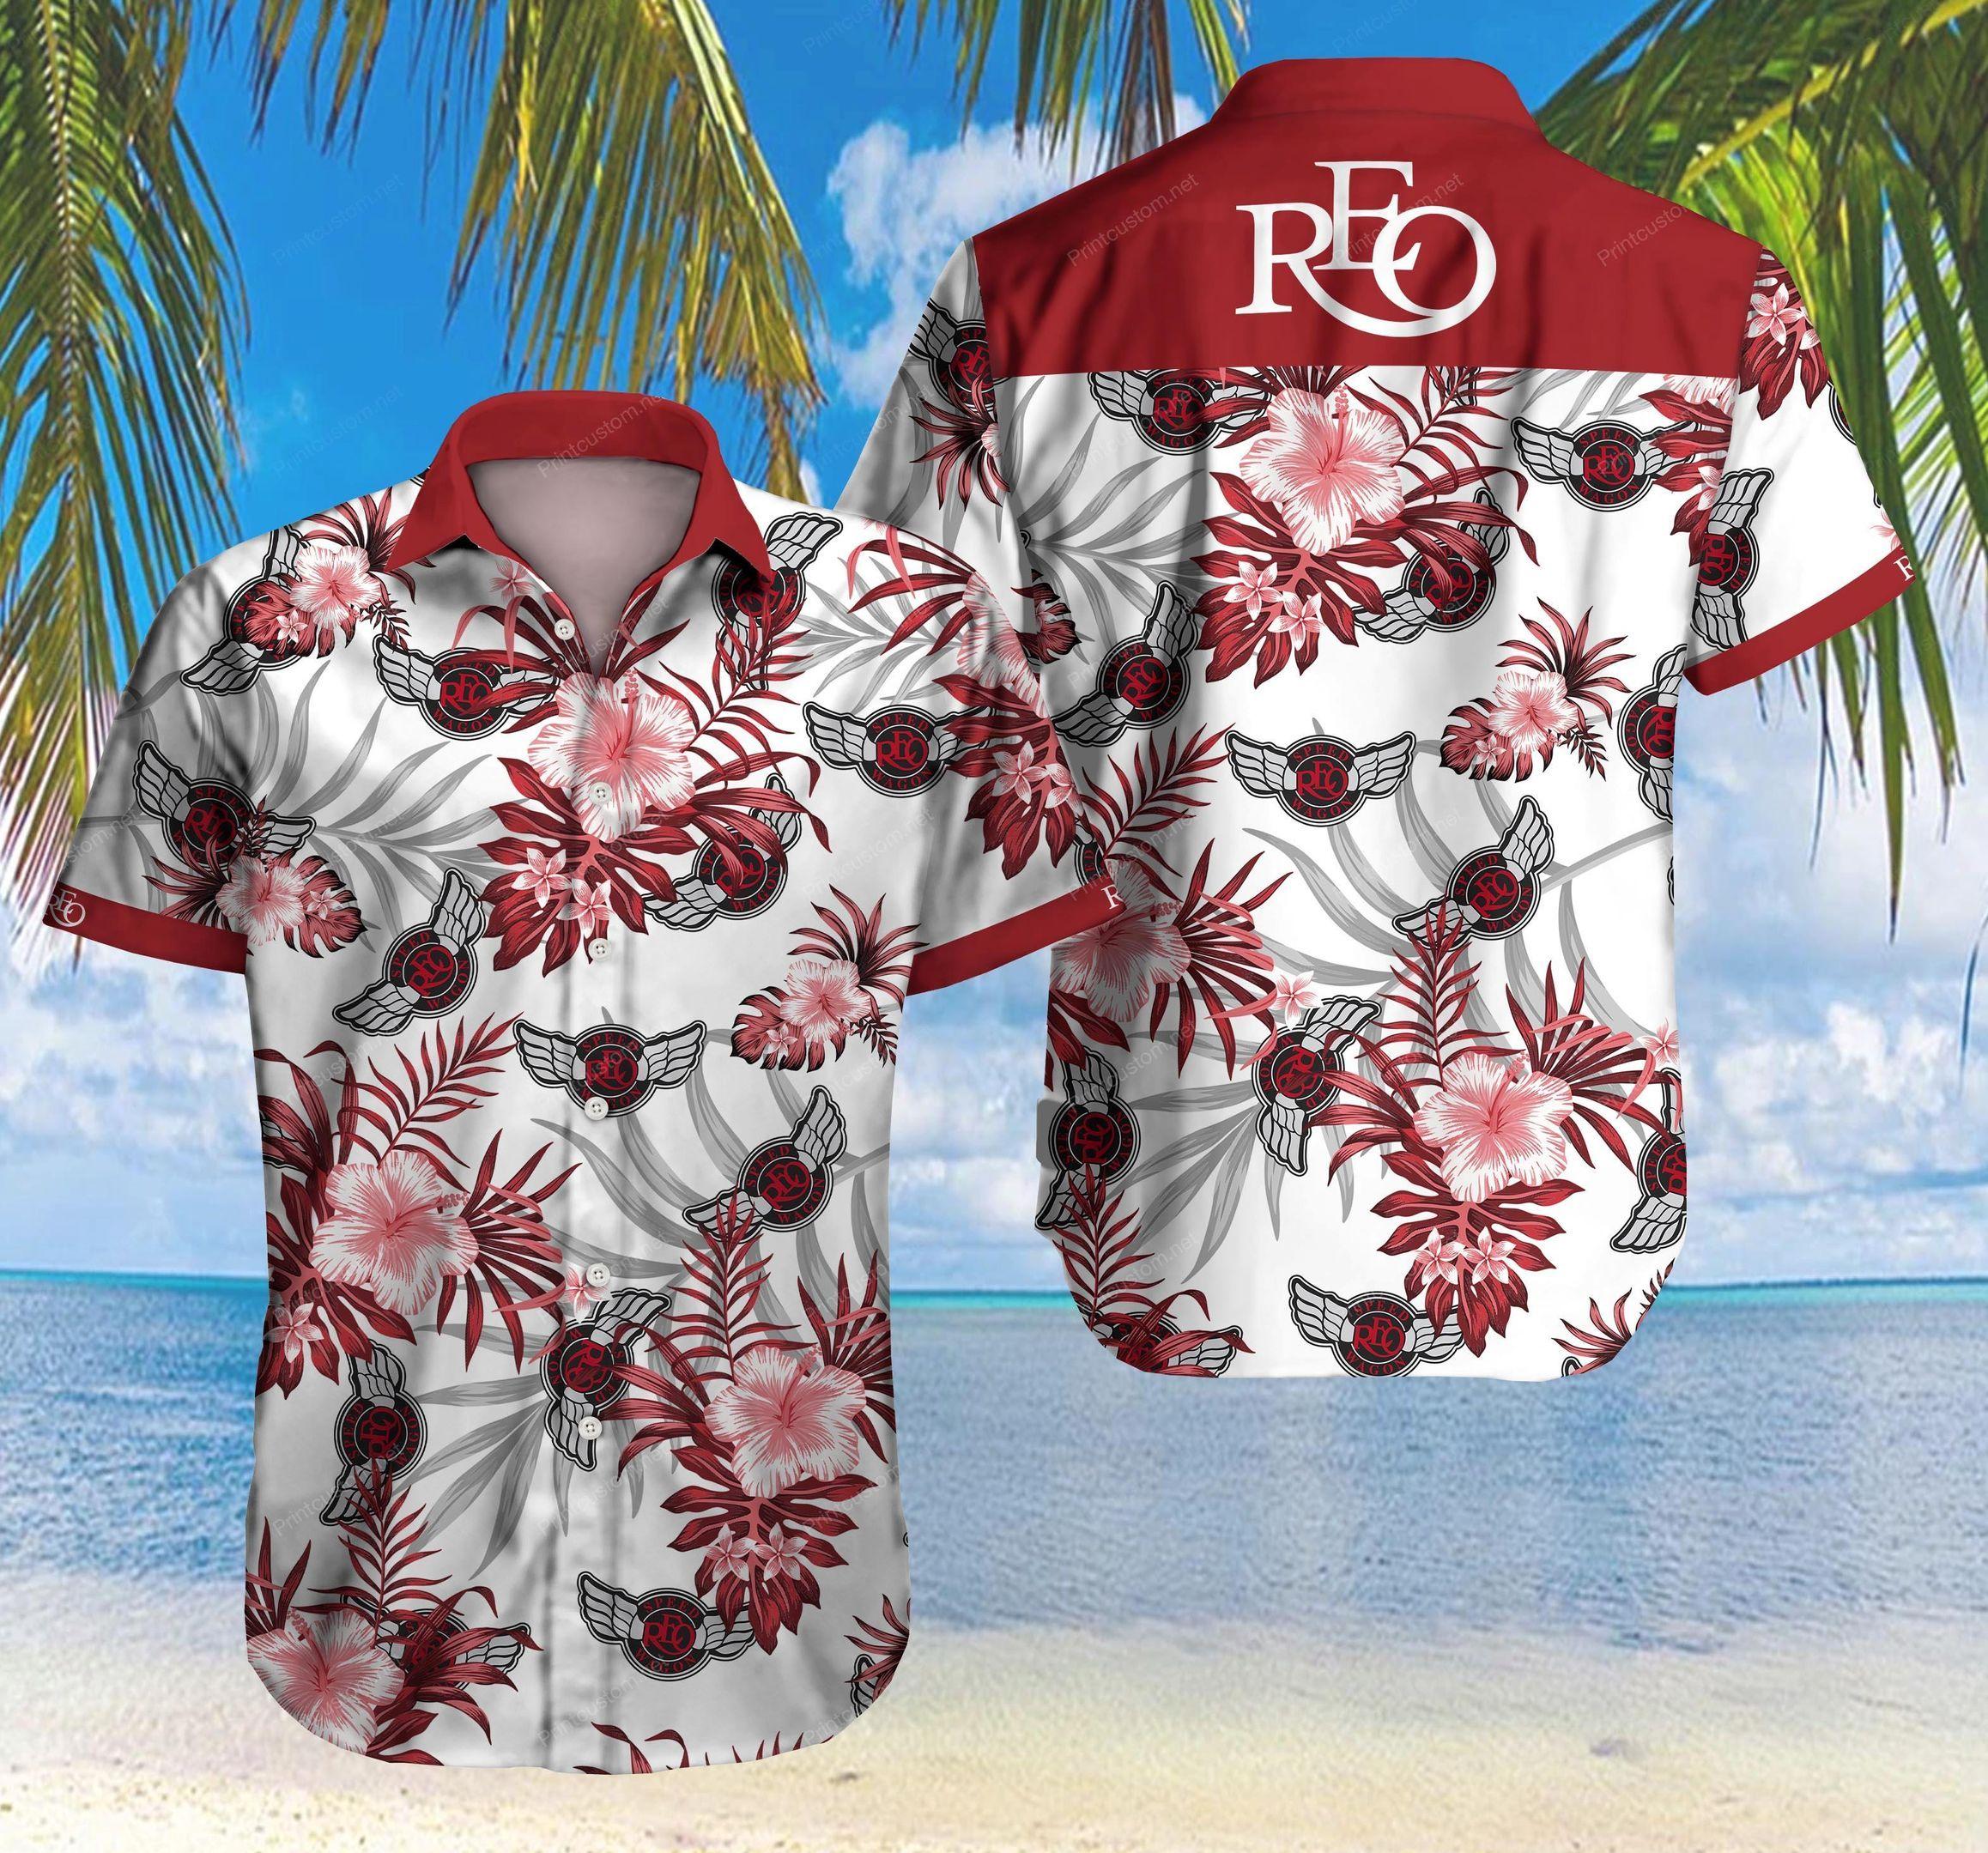 Reo Speedwagon Hawaii Shirt